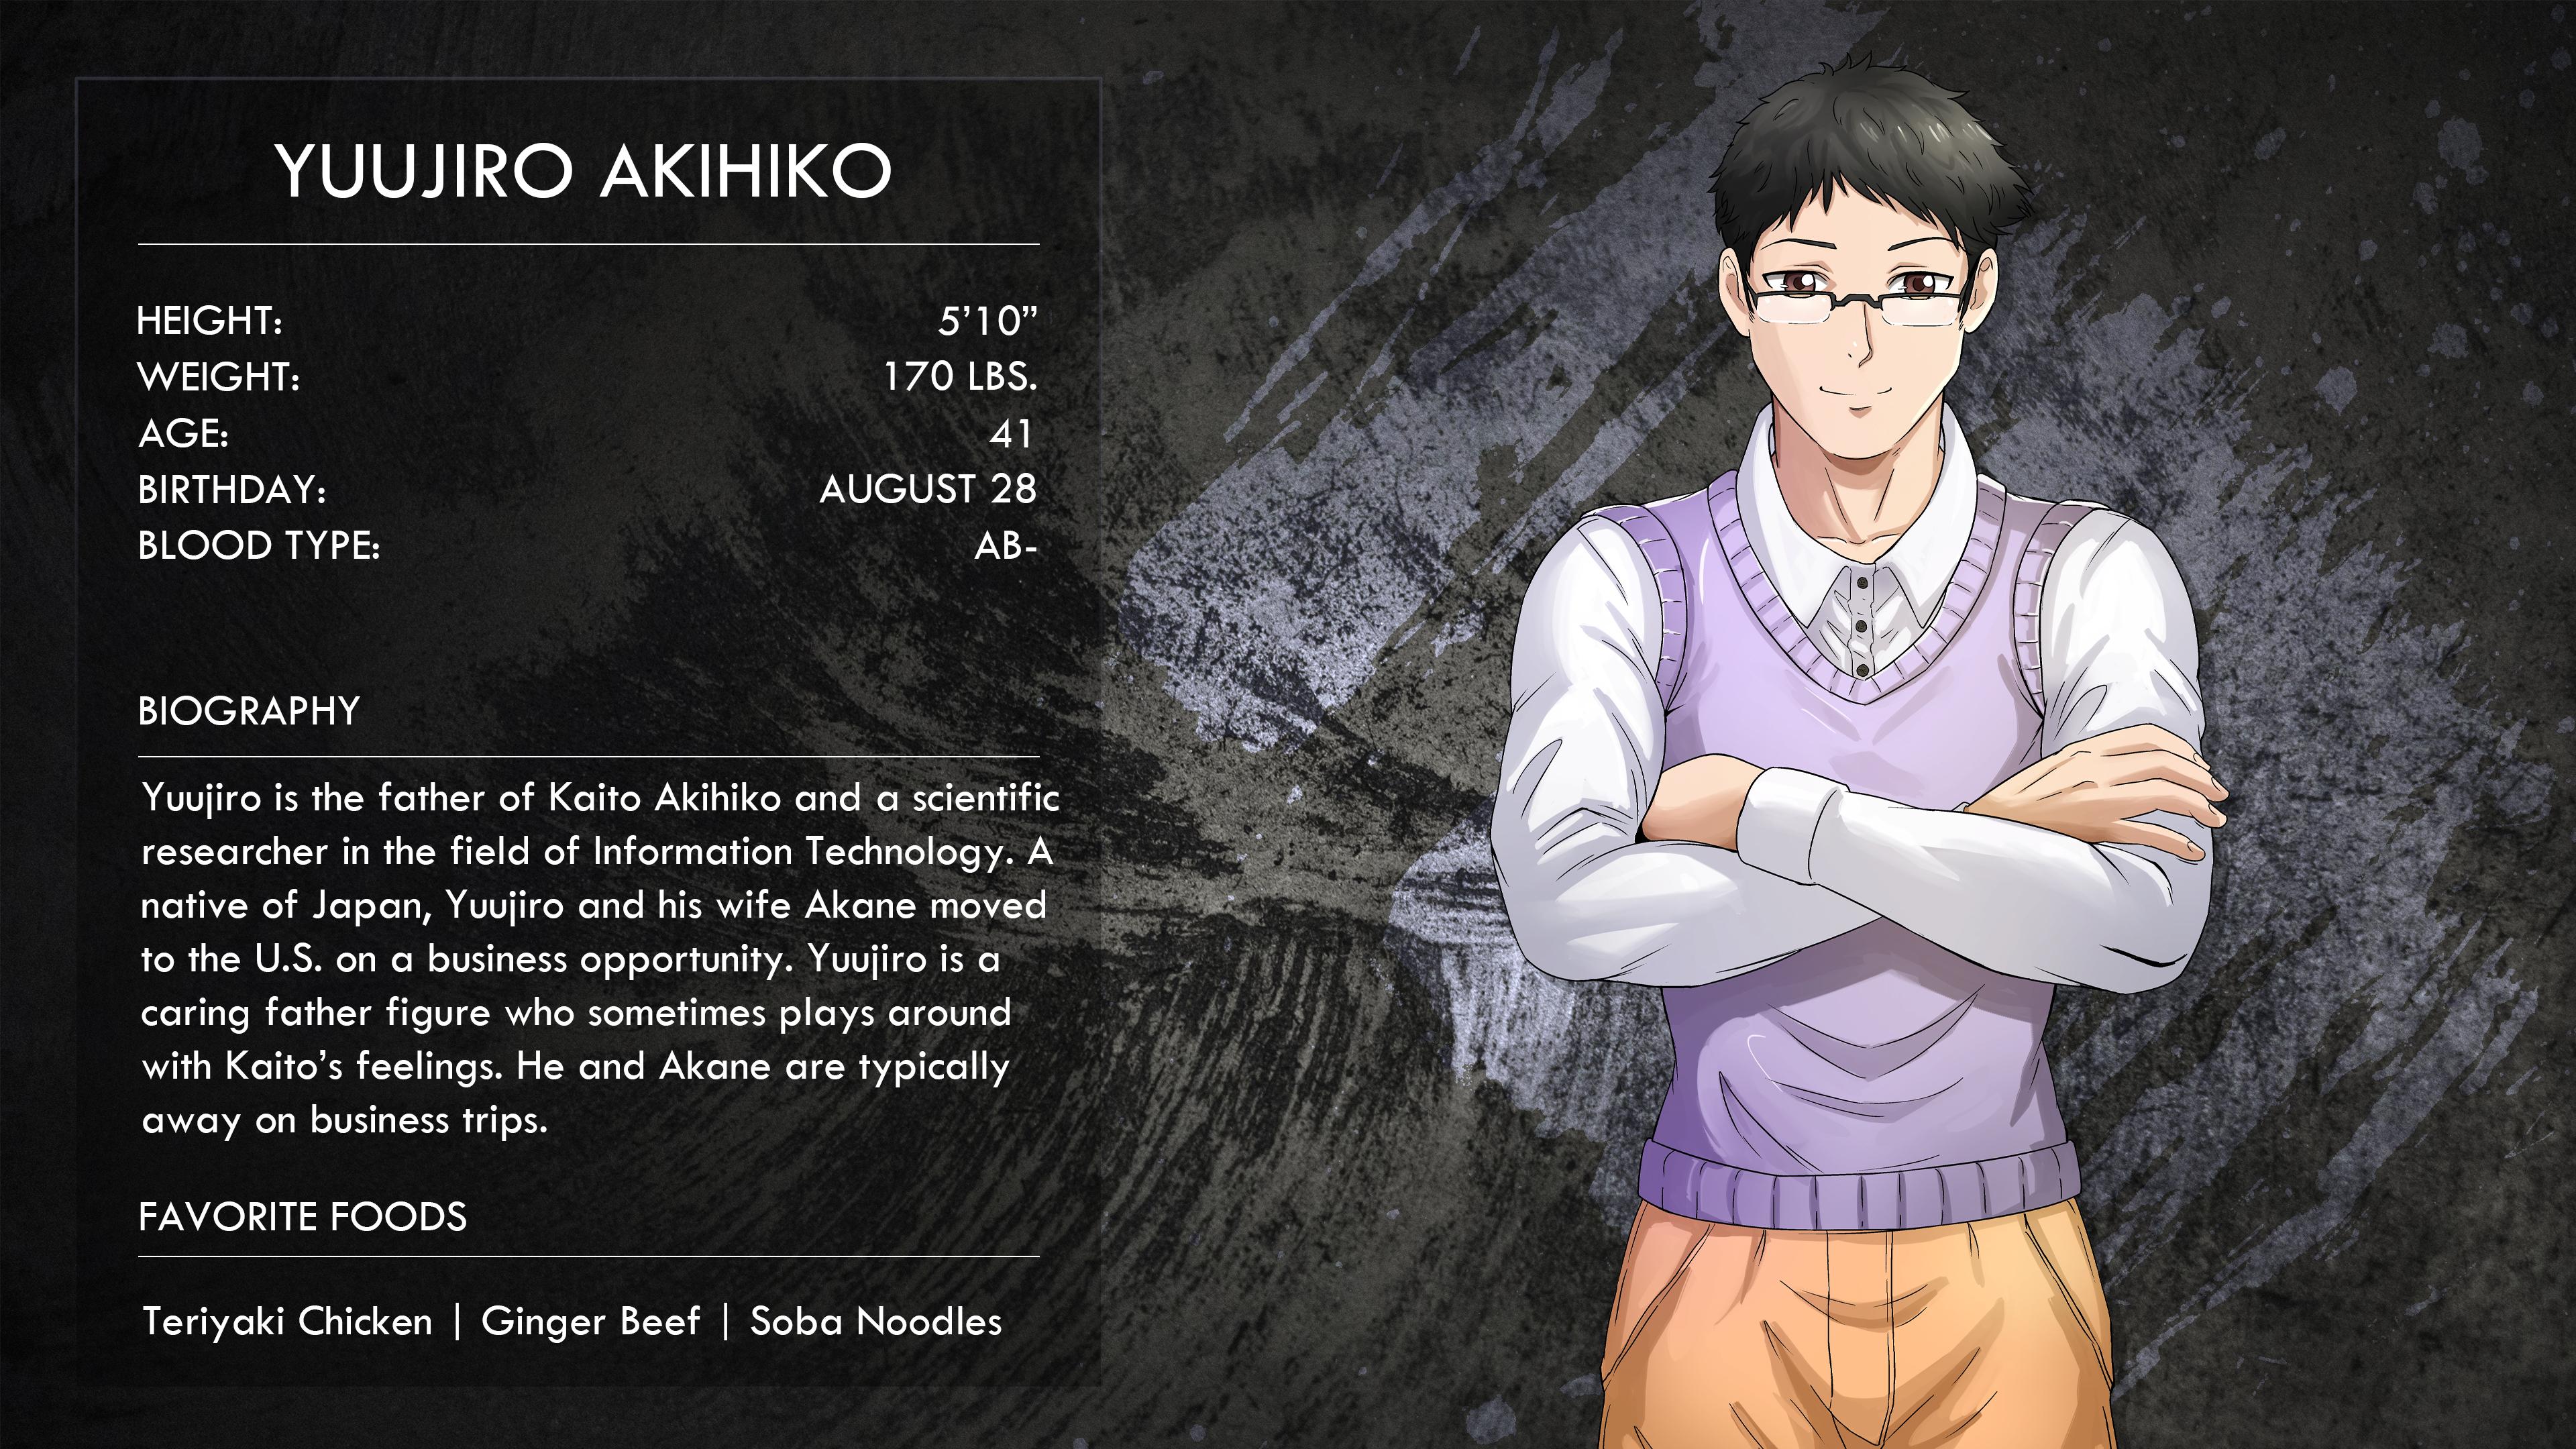 Yuujiro Akihiko